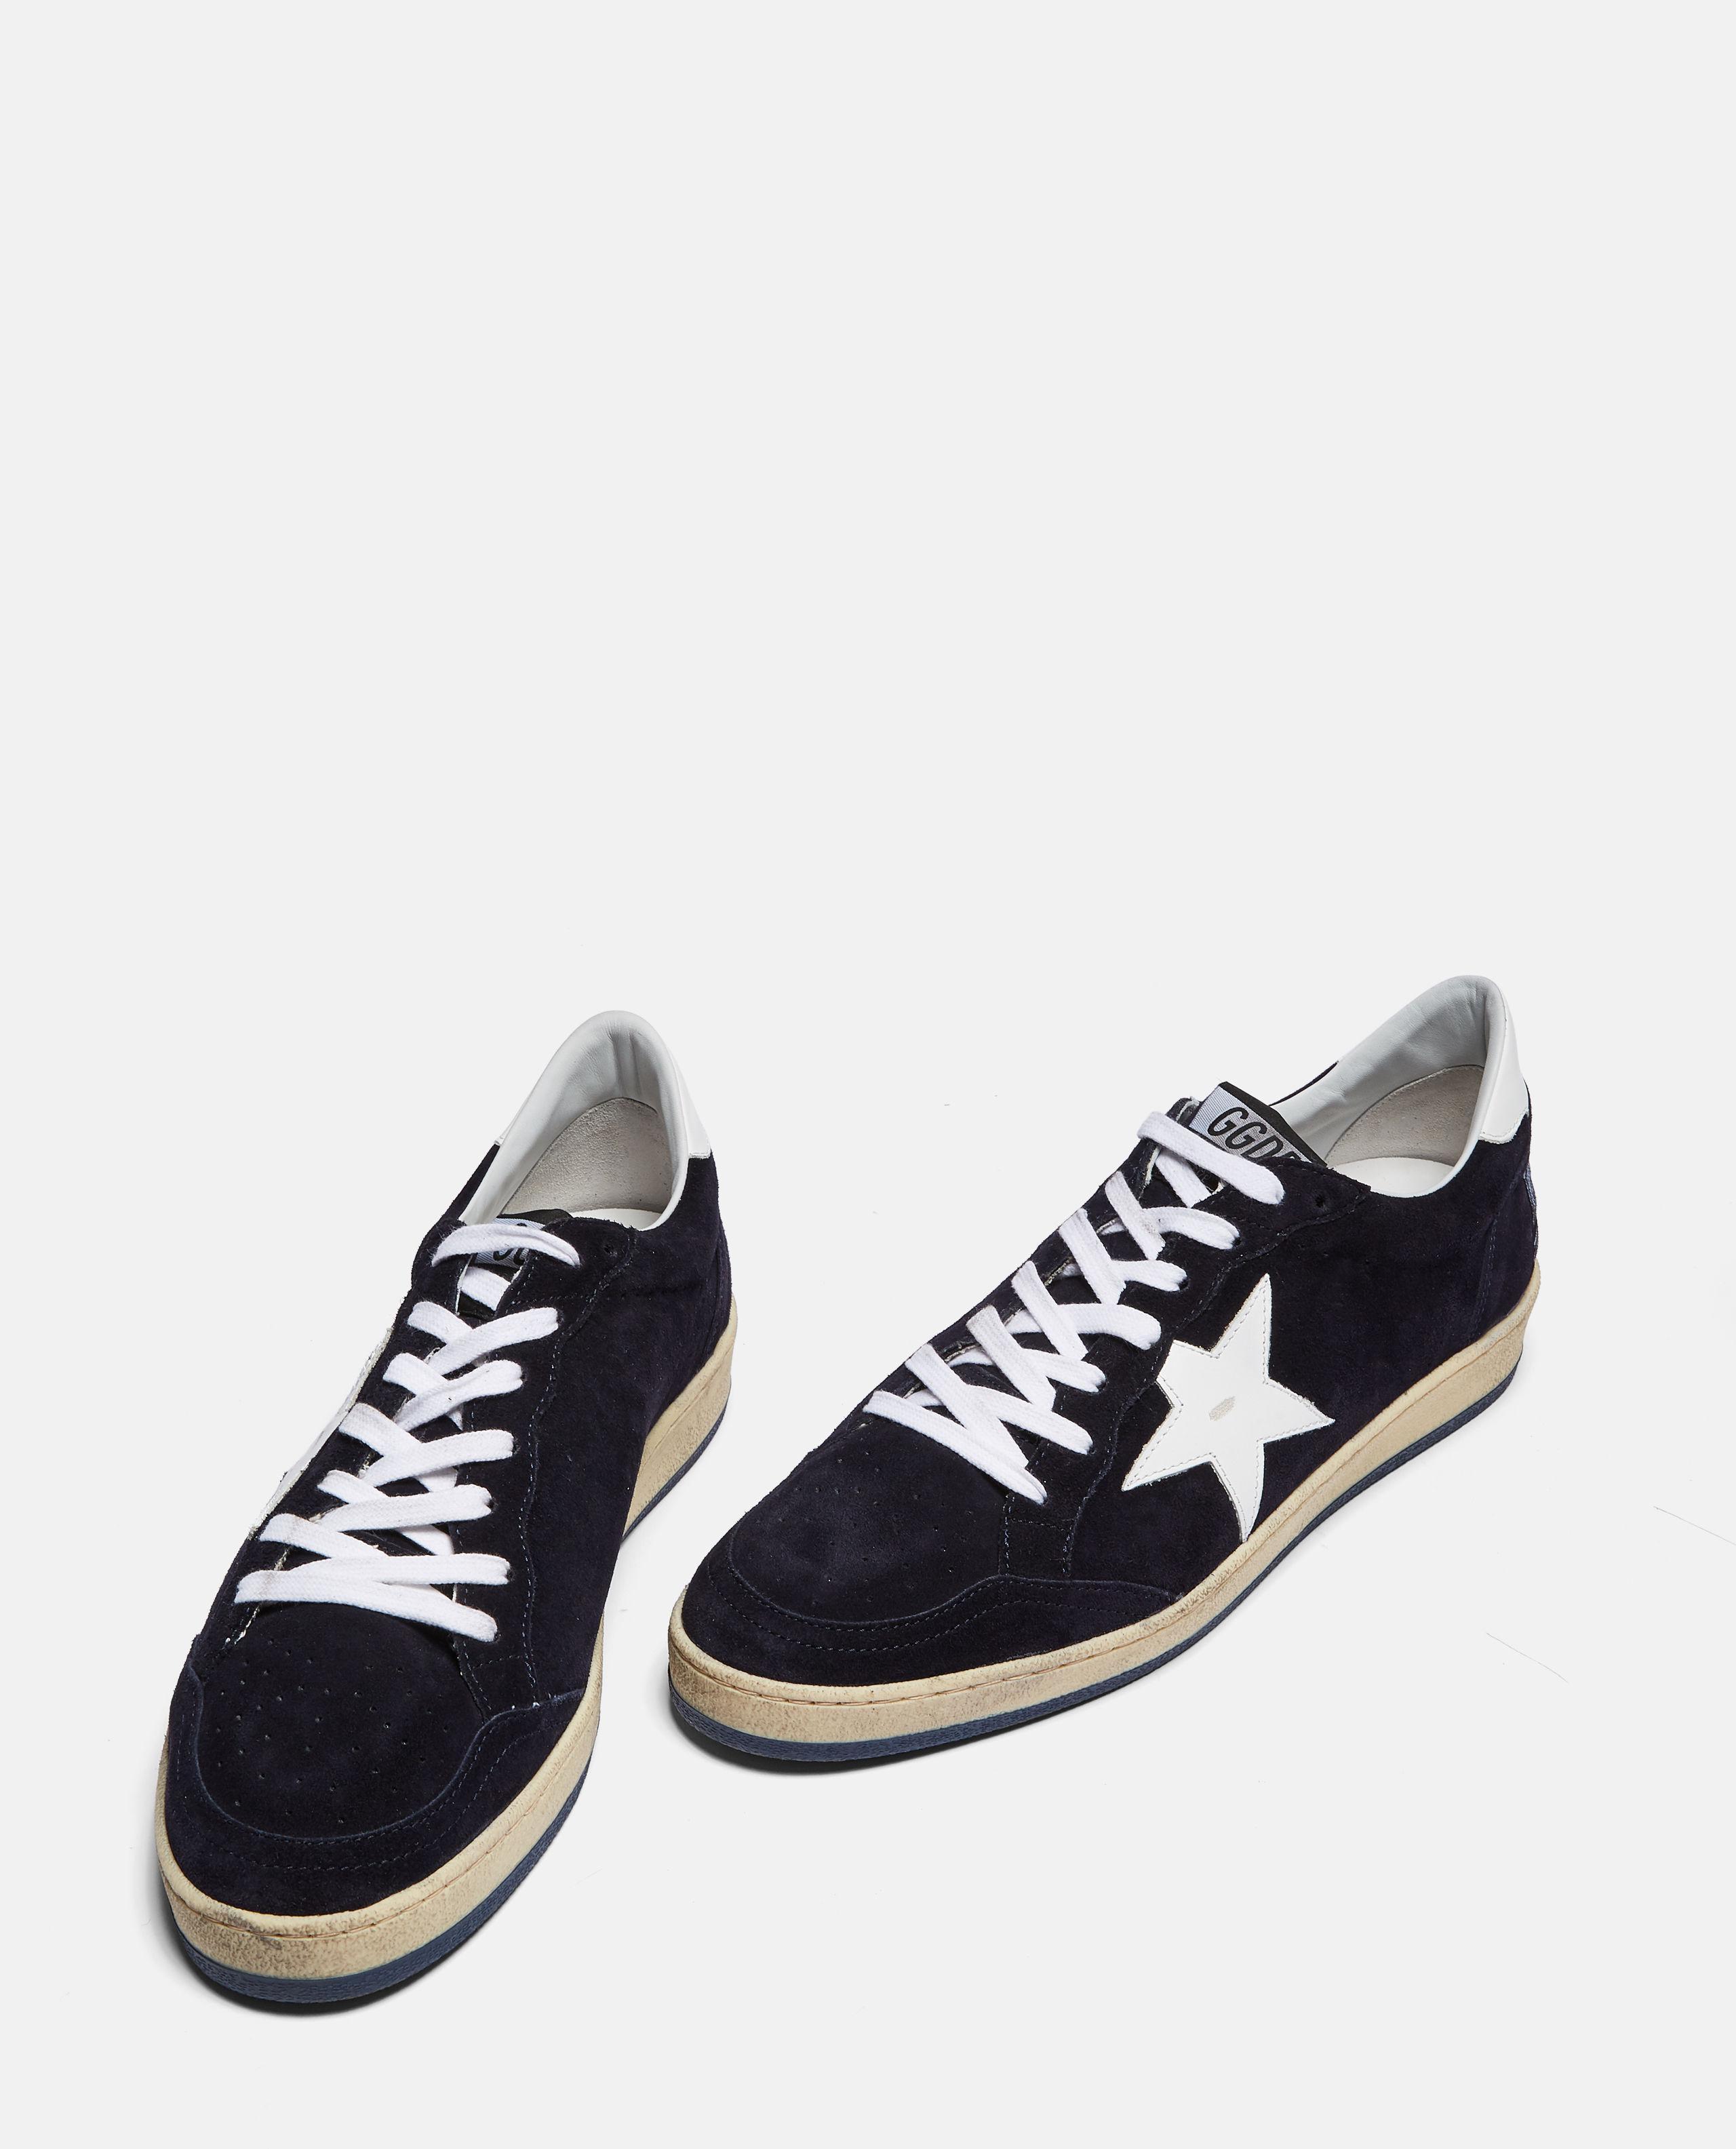 77cbd11d99626 Golden Goose Deluxe Brand Ball Star Sneaker In Suede in Blue for Men - Lyst